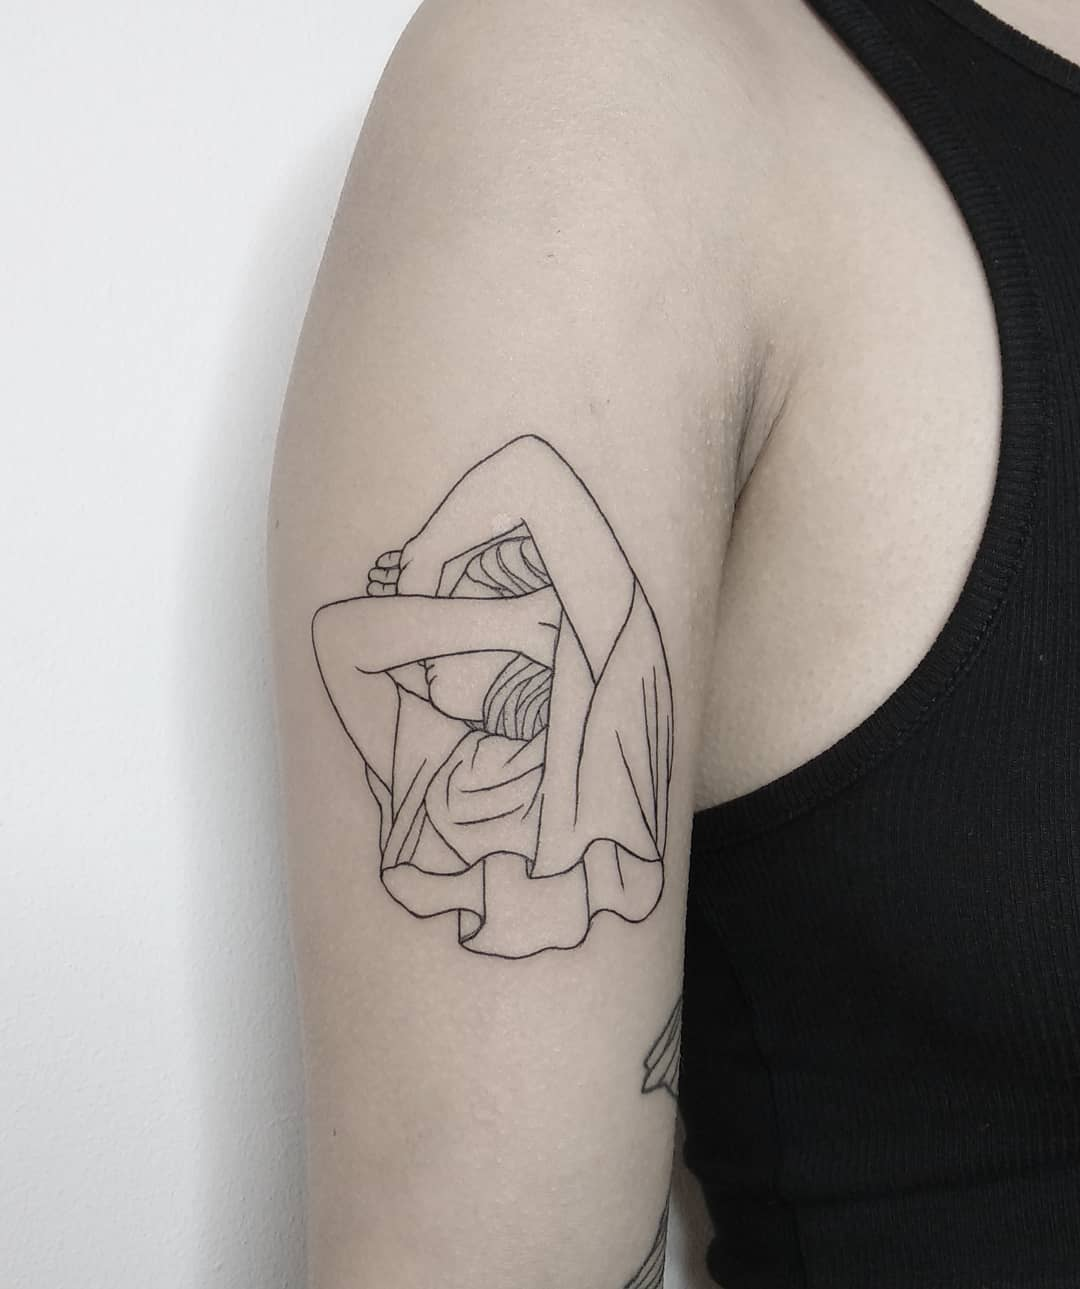 Stretching girl tattoo by Tattson